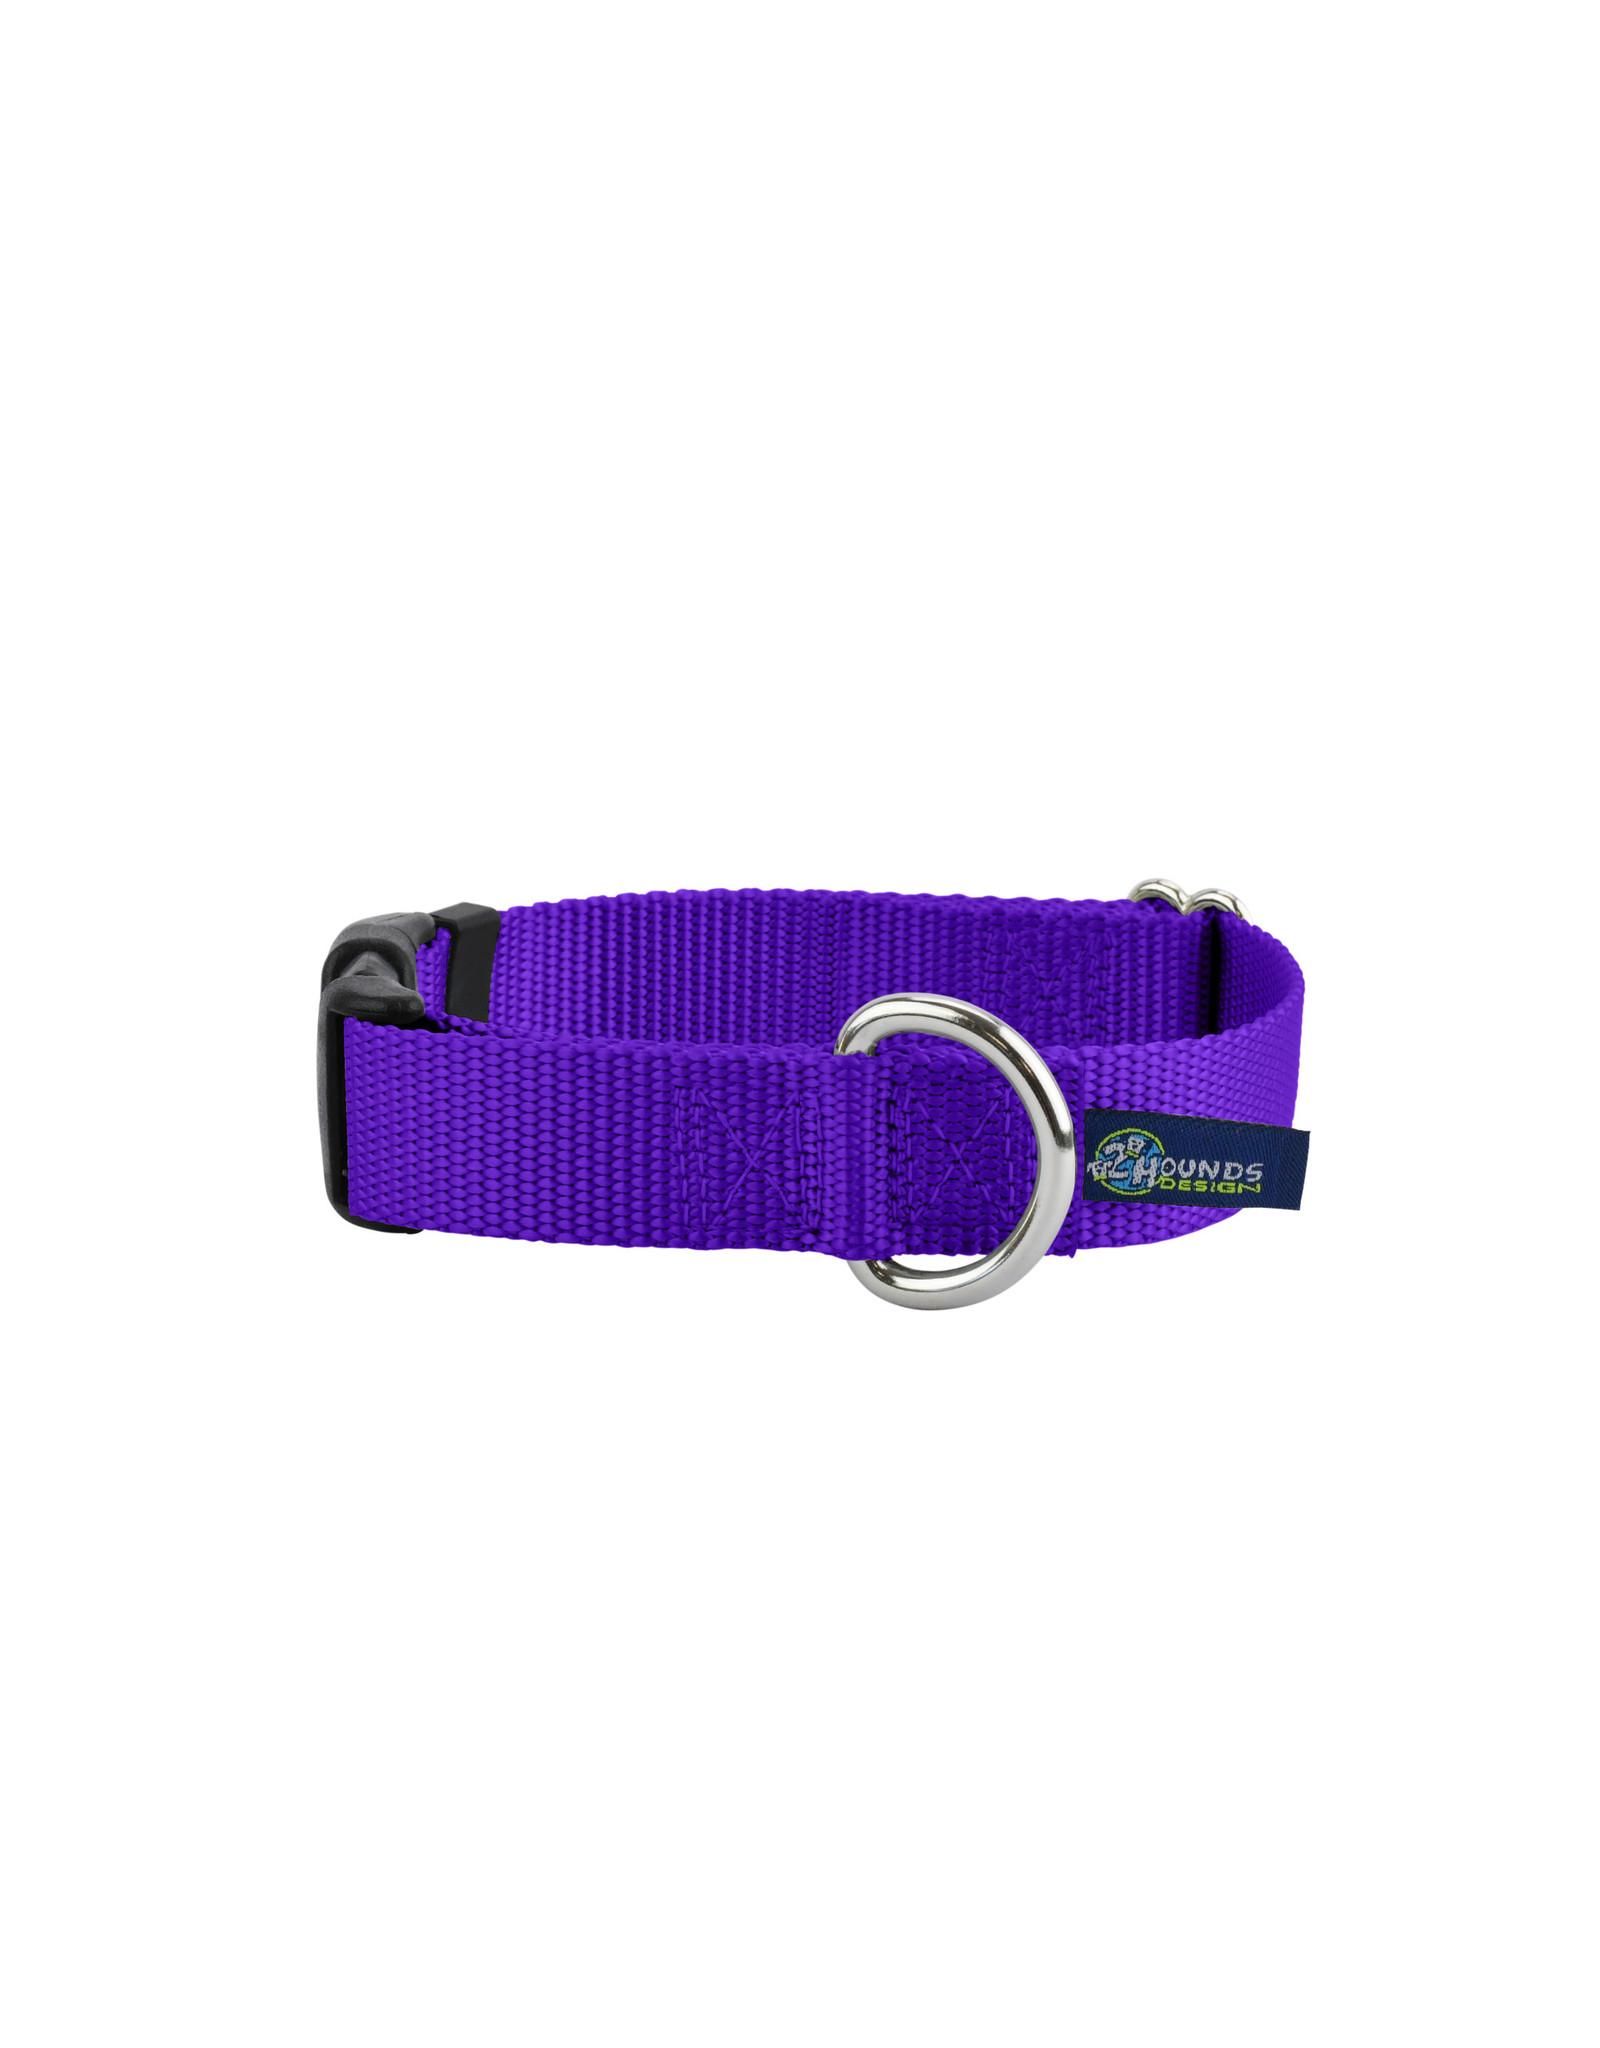 "2 Hounds Design Buckle Collar: Purple, 1.5"" XL"